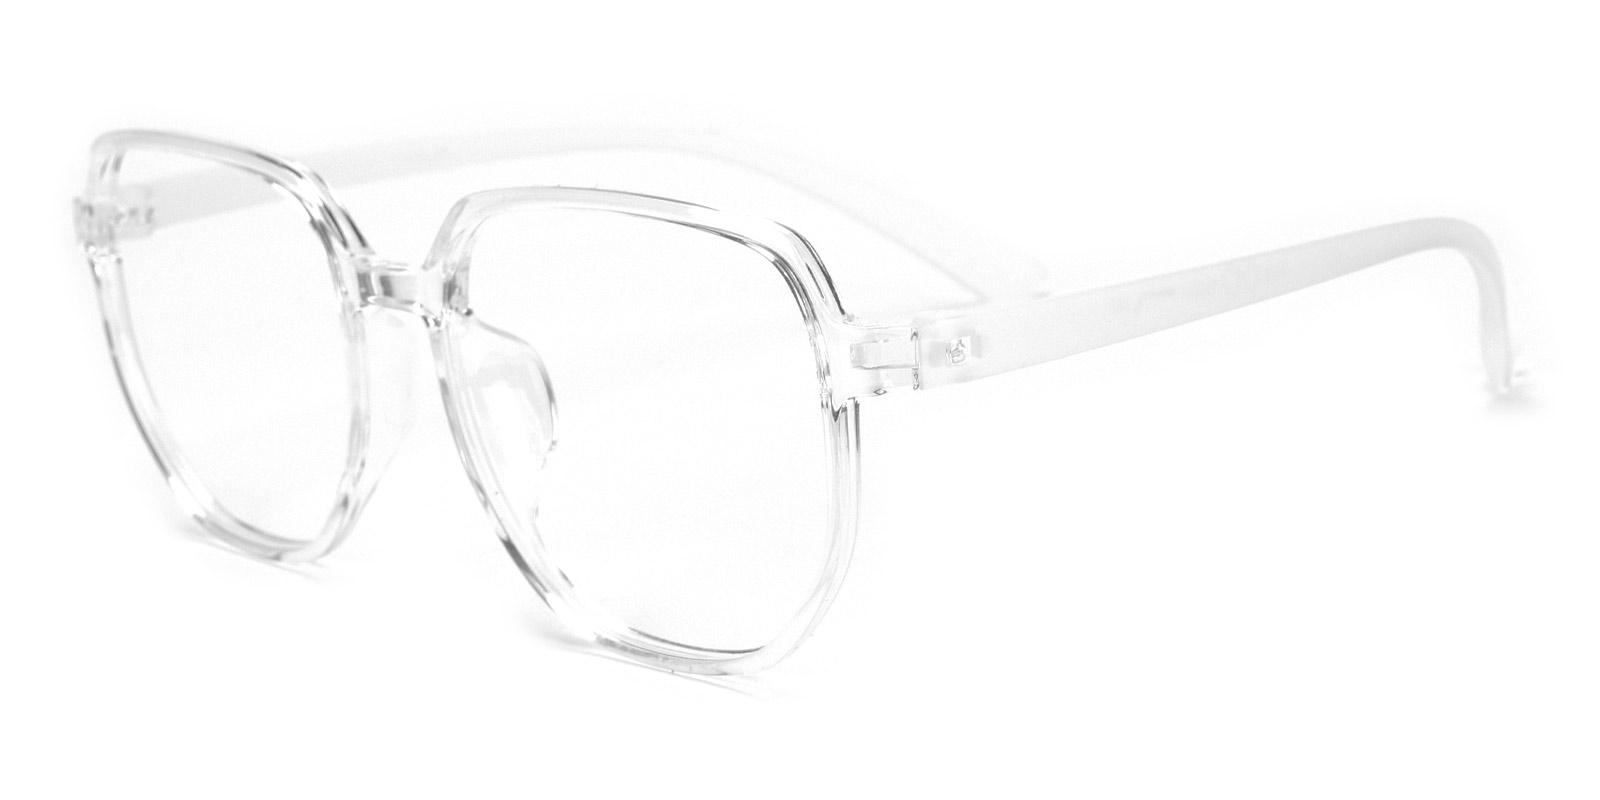 Pie-Translucent-Square-TR-Eyeglasses-additional1